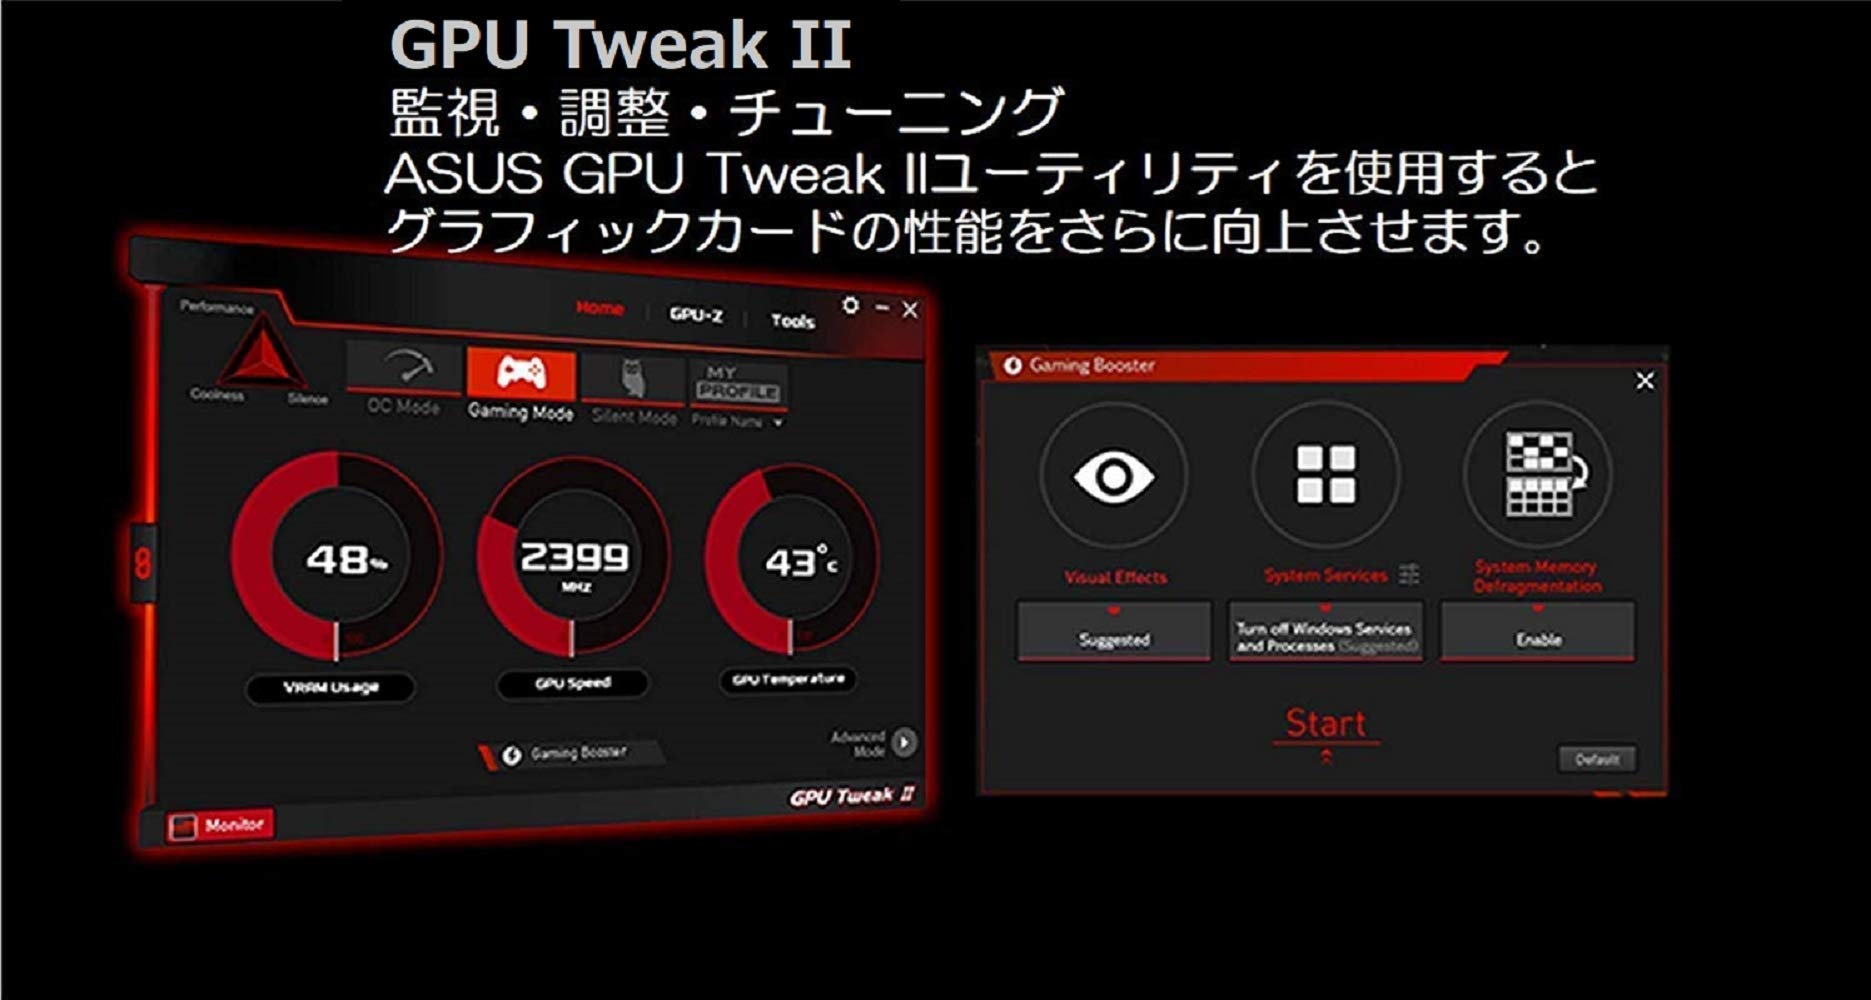 ASUS GeForce RTX 2070 8G EVO Turbo Edition GDDR6 HDMI DP 1.4 Graphics Card (TURBO-RTX2070-8G-EVO) by ASUS (Image #8)